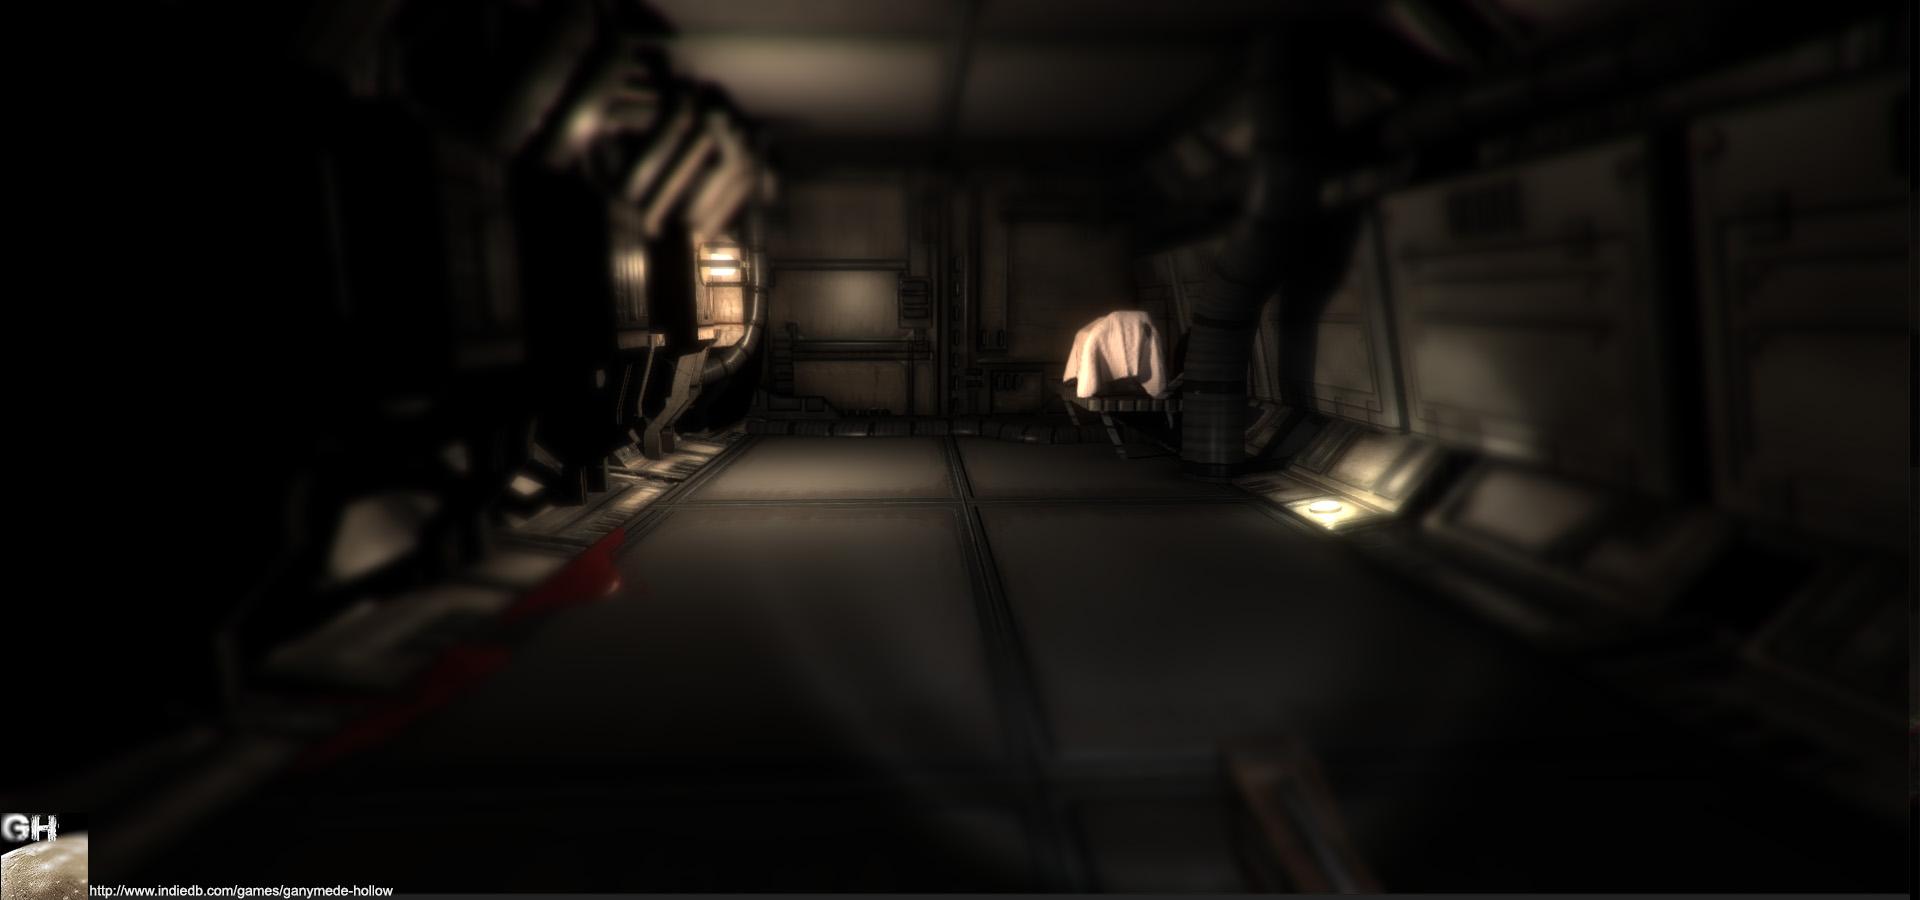 Ganymede Hollow Blog 3: Film Horror Inspirations news - Mod DB